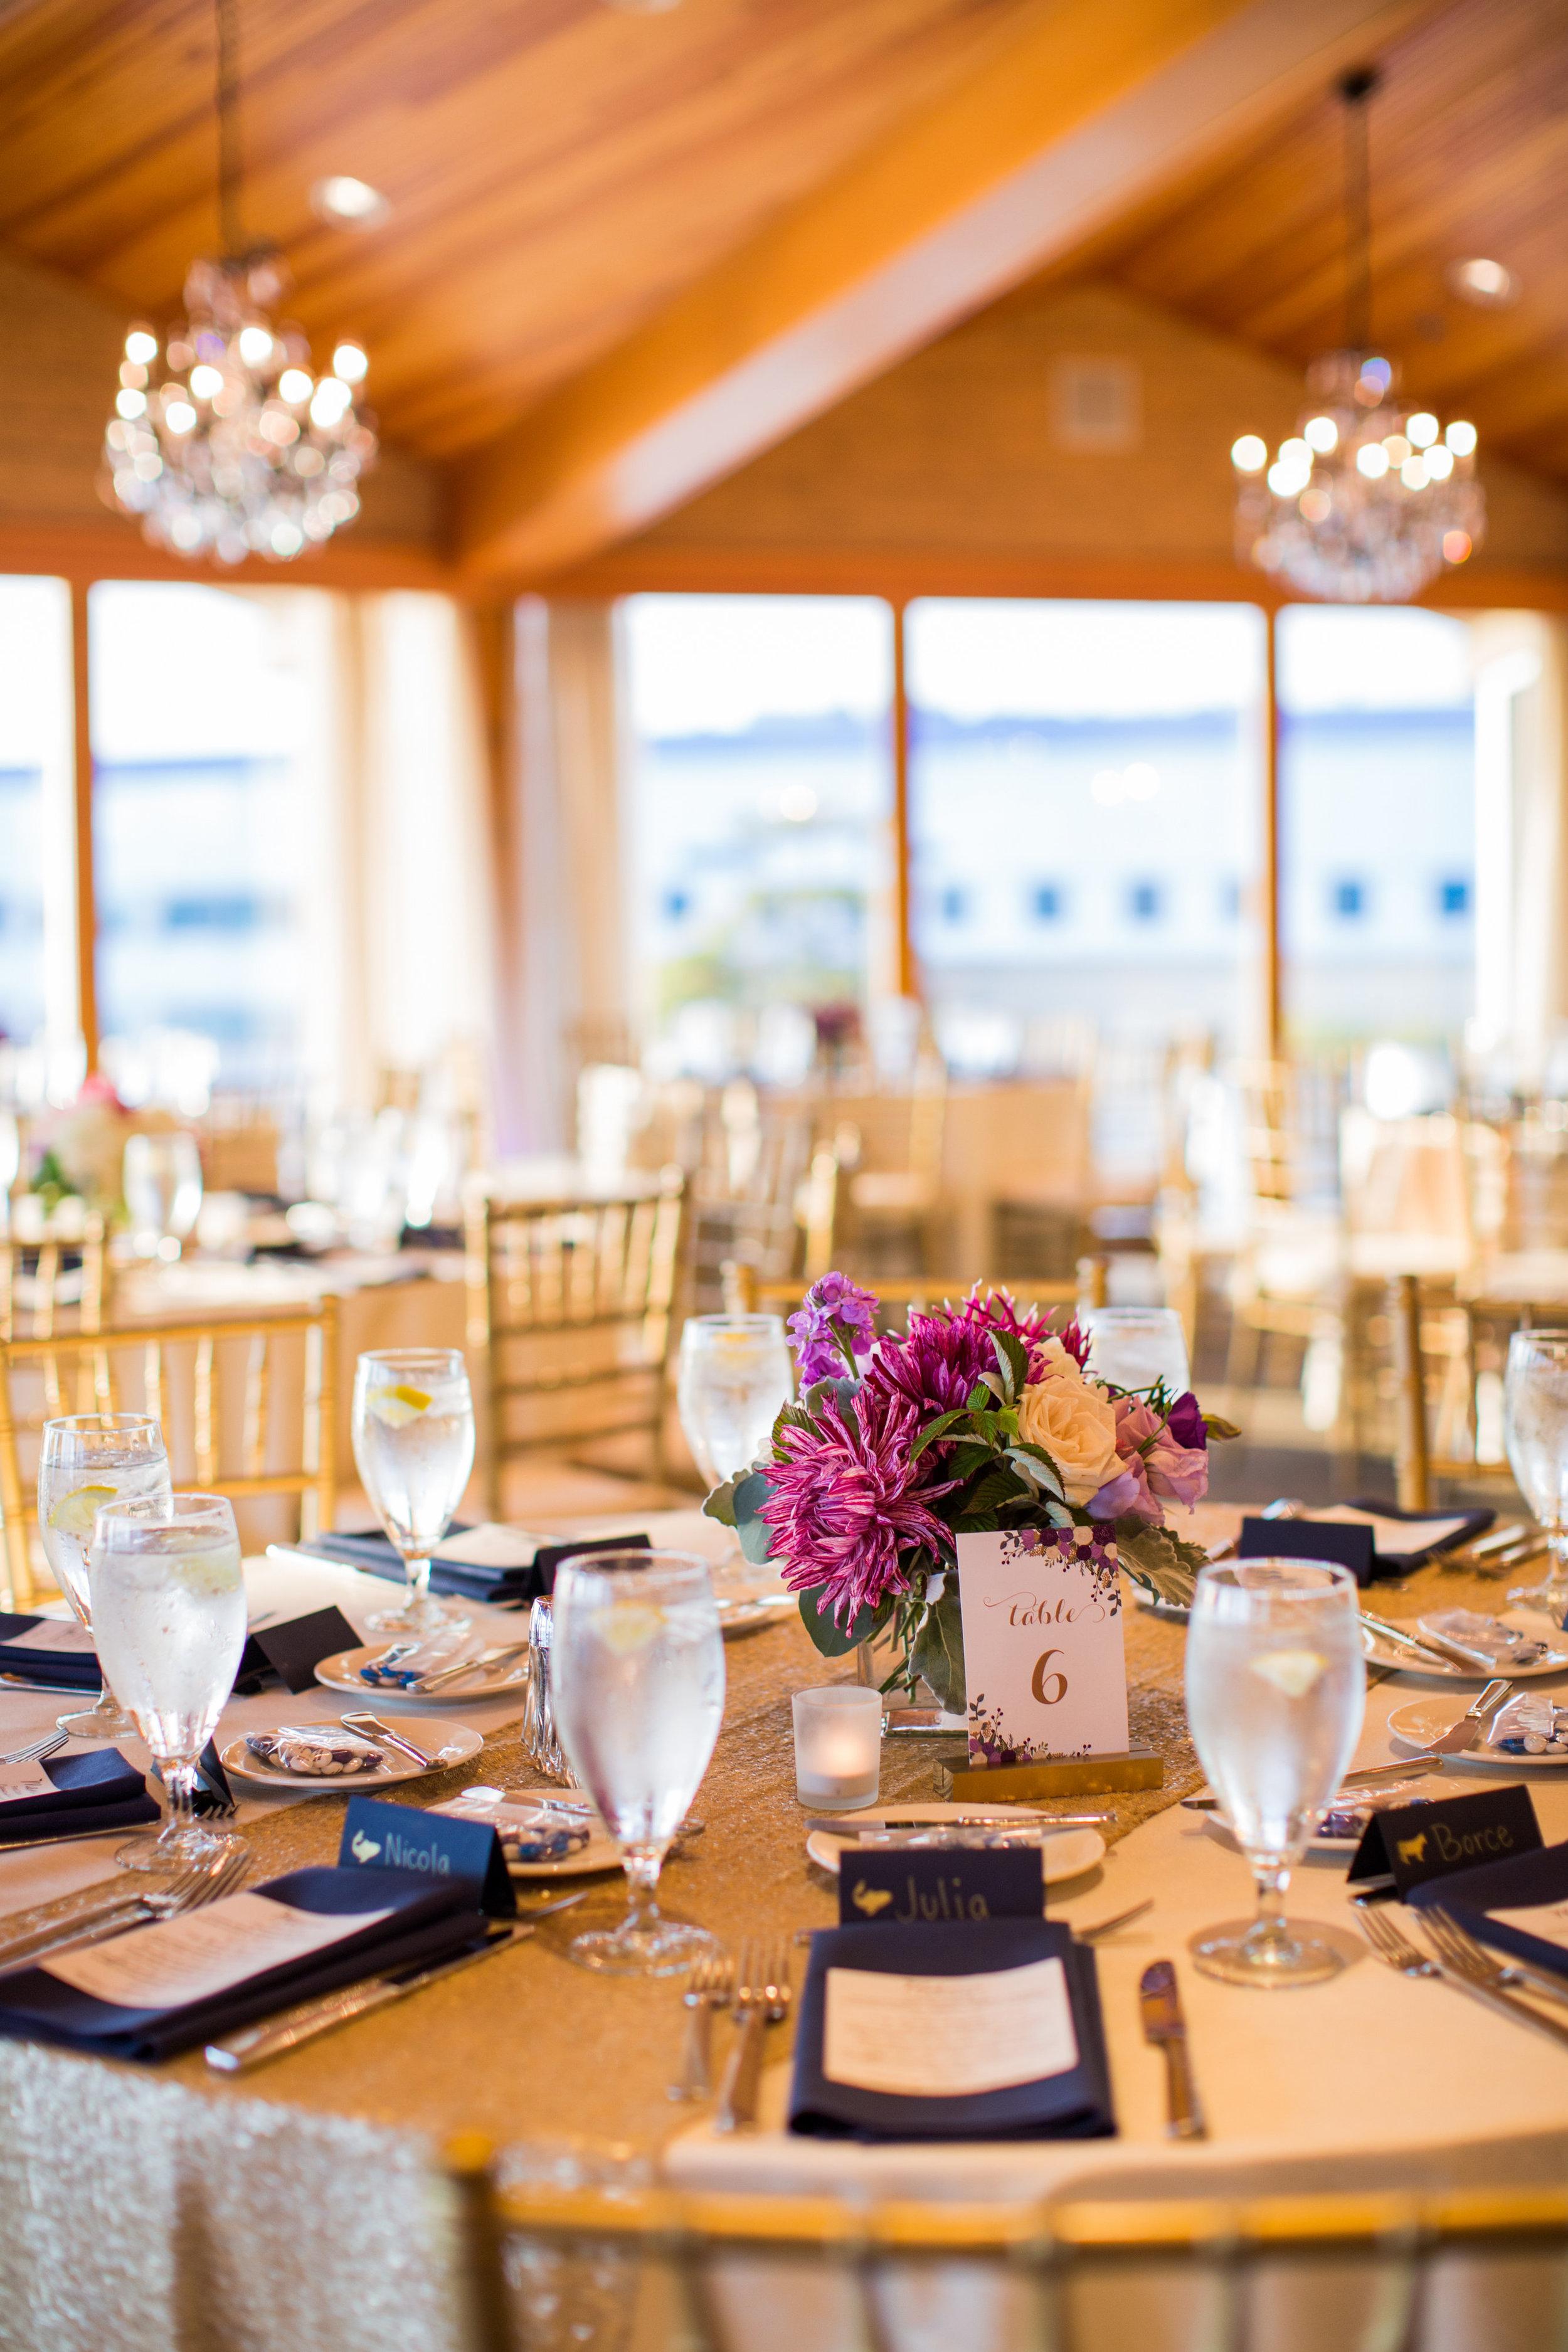 Seattle Wedding Planner, Wedding Wise | Ciccarelli Photography | Edgewater Hotel Wedding | Waterfront wedding | Purple and Navy Blue wedding